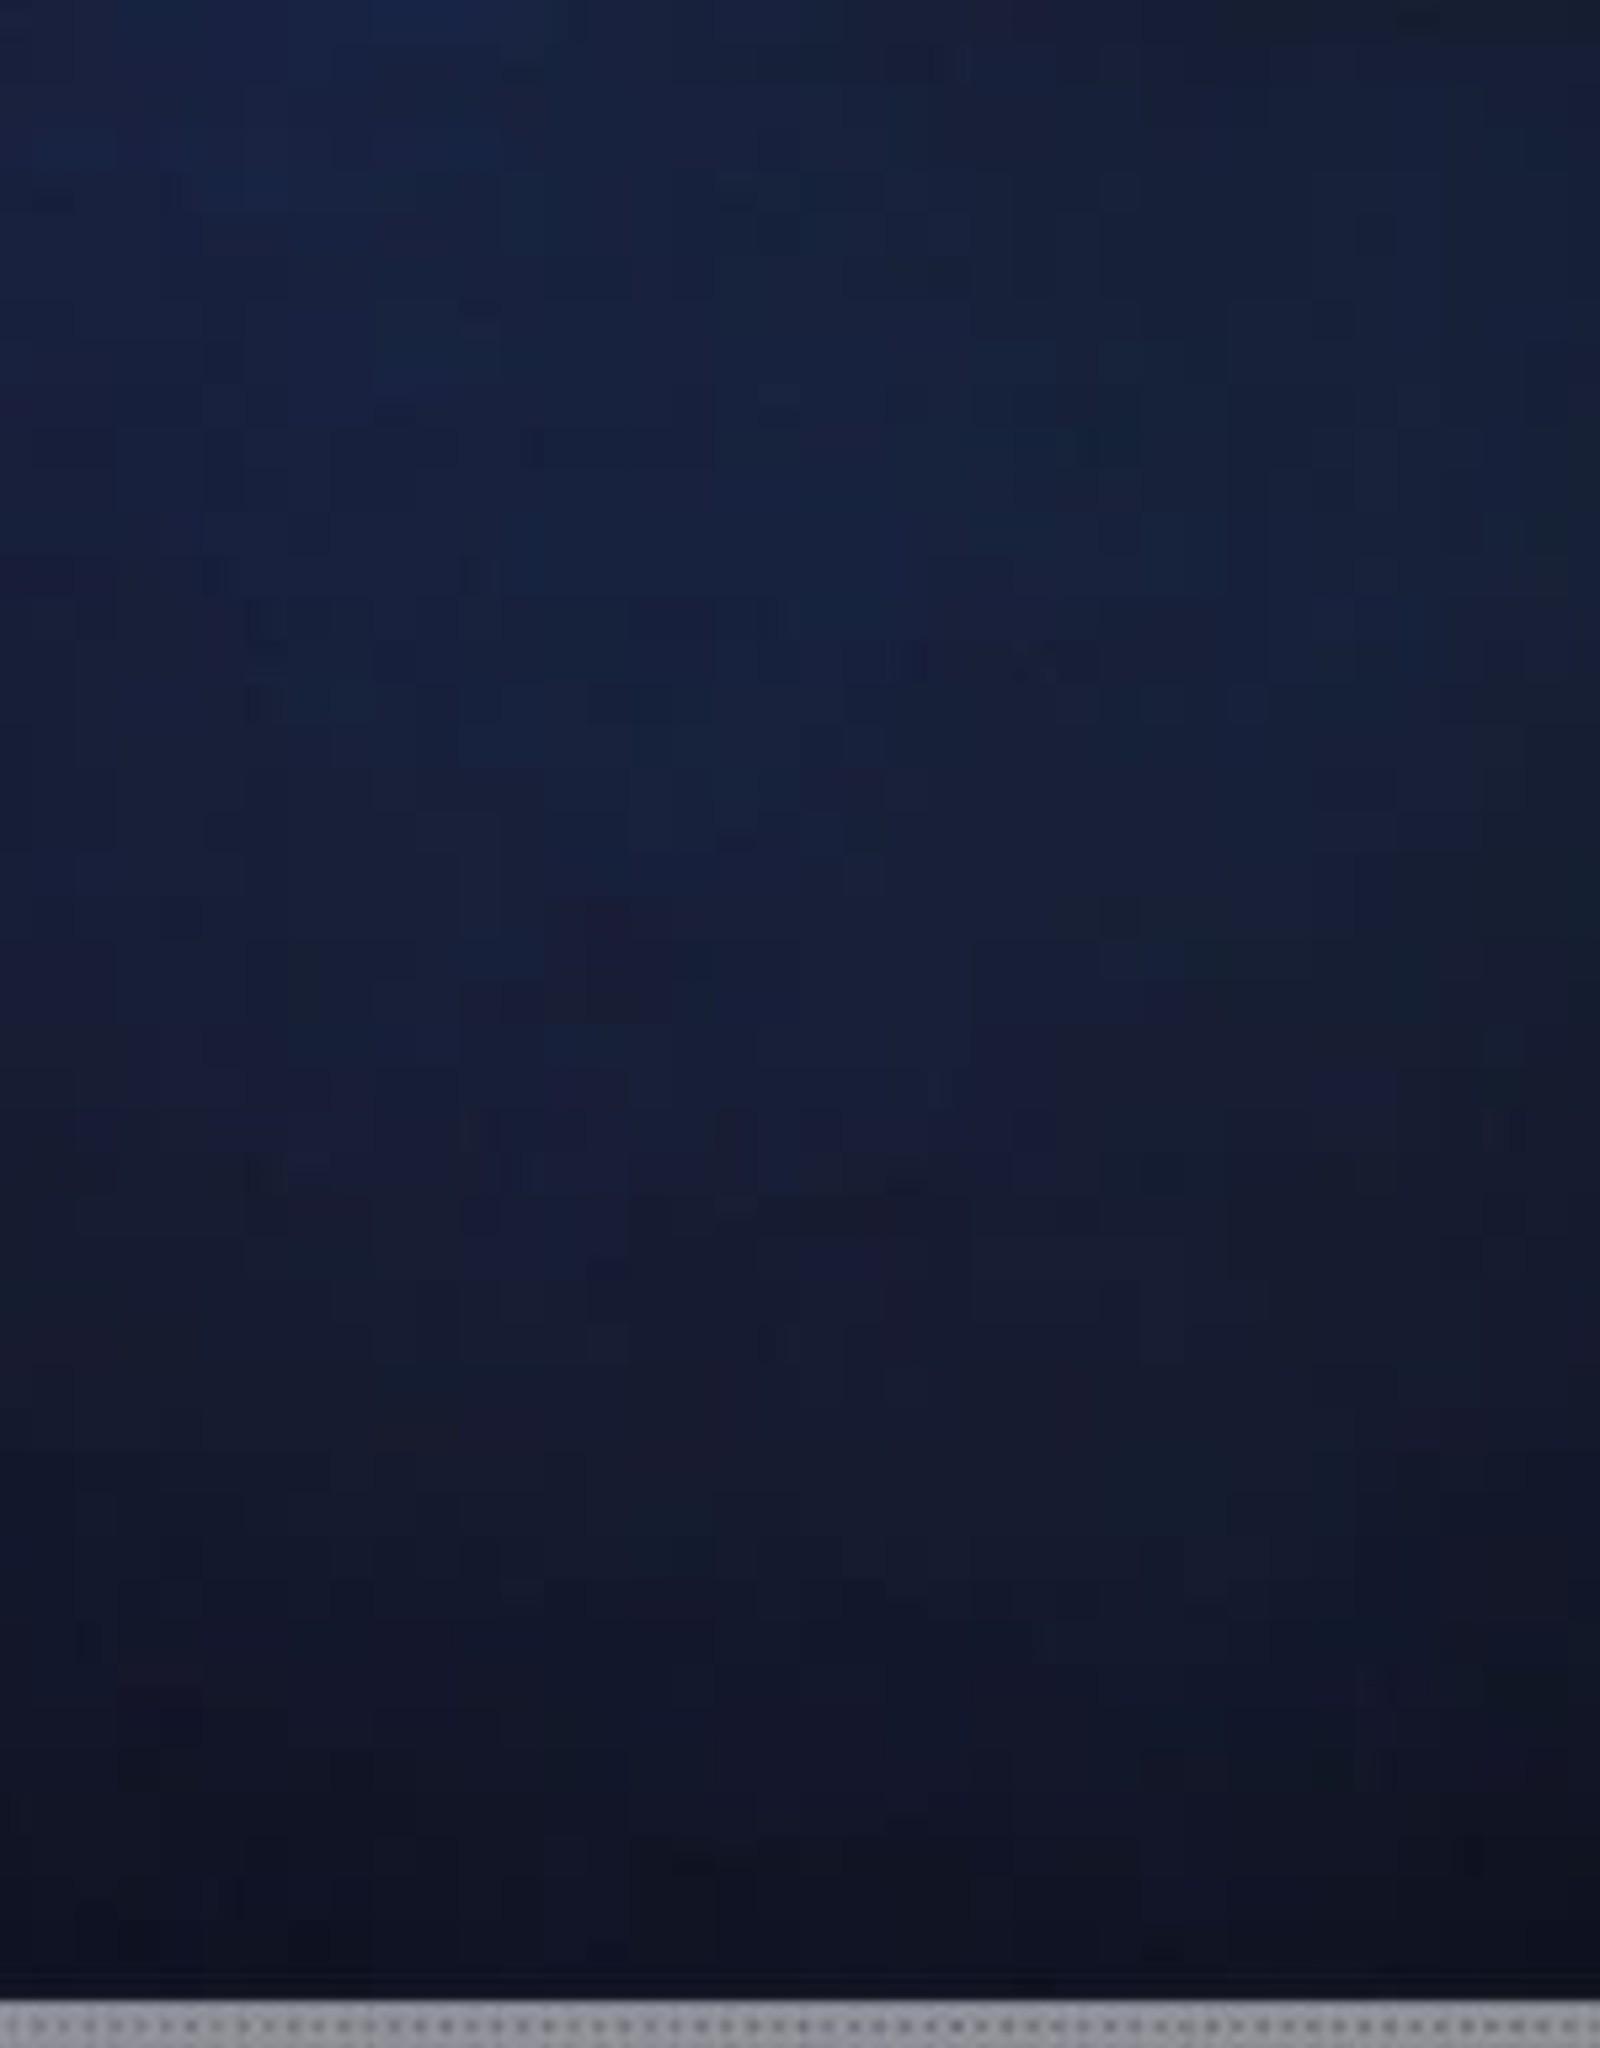 Polytex Polytex WOVEN TENCEL PLAIN donkerblauw